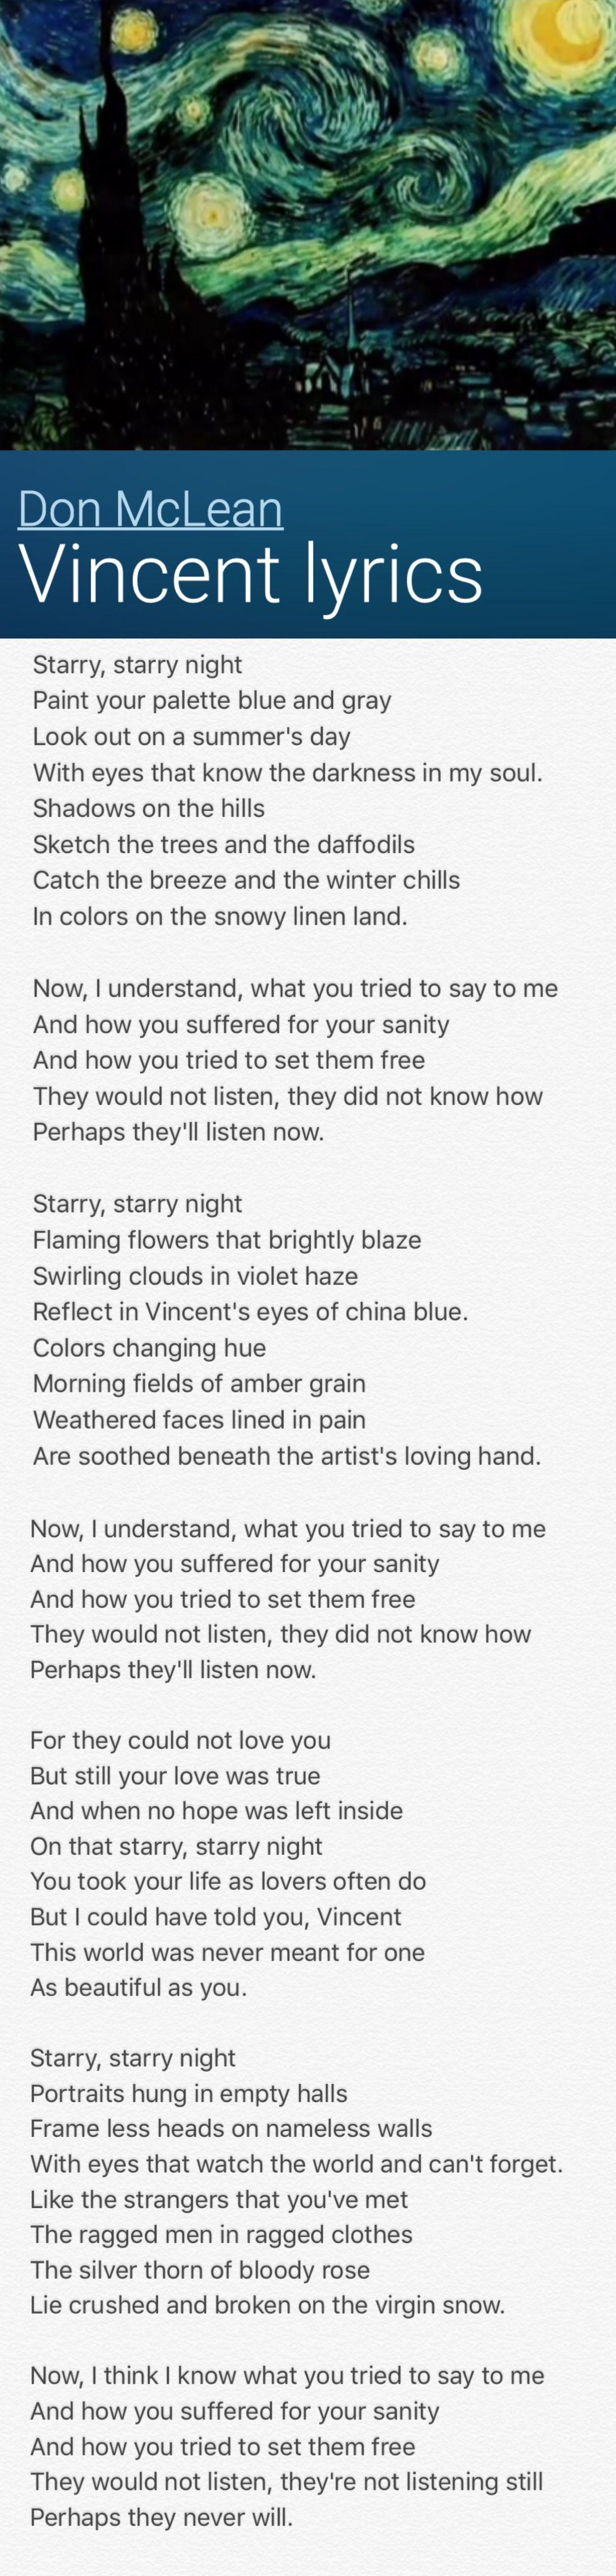 Ok Go The Writing S On The Wall Lyrics Don Maclean S Vincent Great Song Lyrics Lyrics Music Lyrics